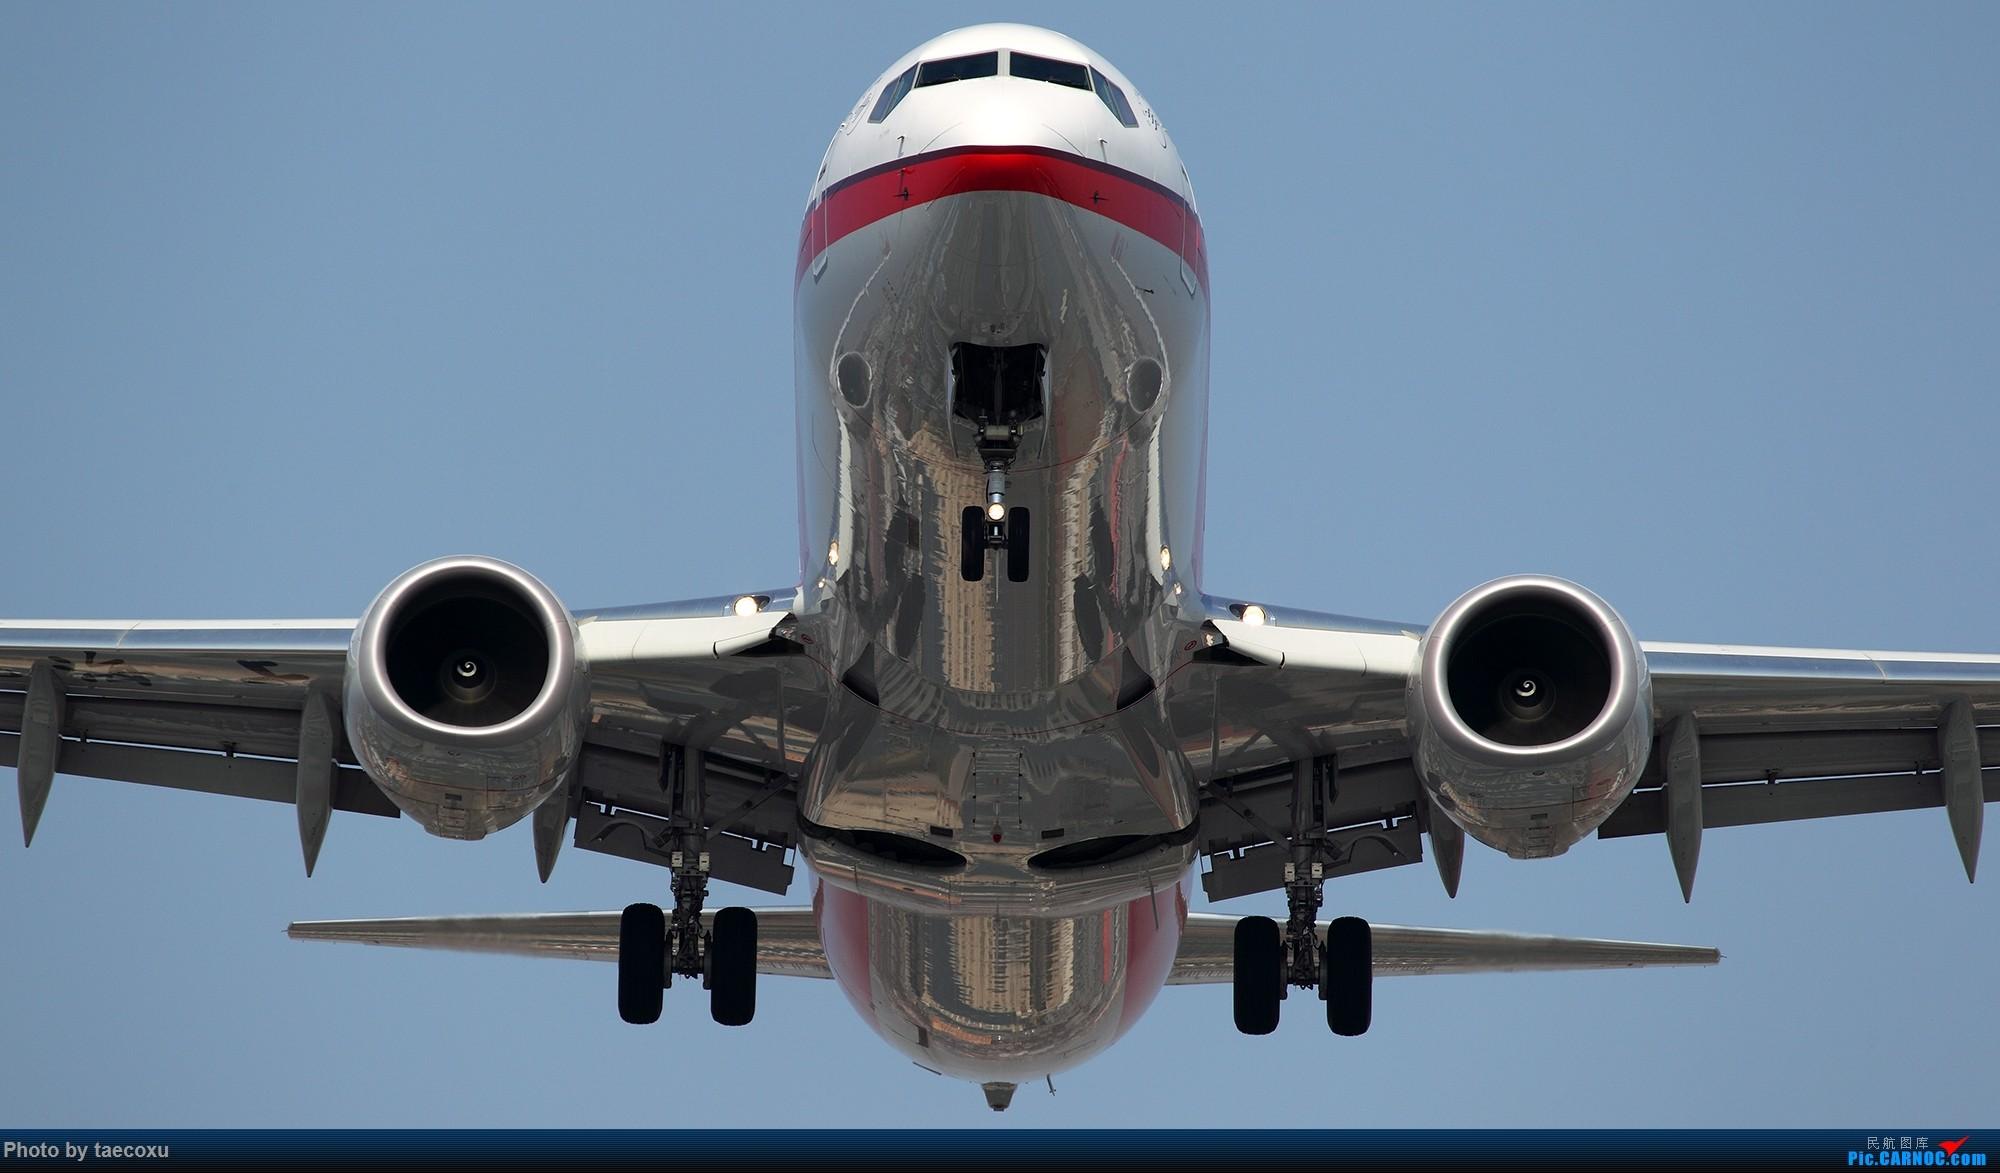 Re:[原创]据说能发大图了 BOEING 737-800 B-2168 中国上海虹桥国际机场